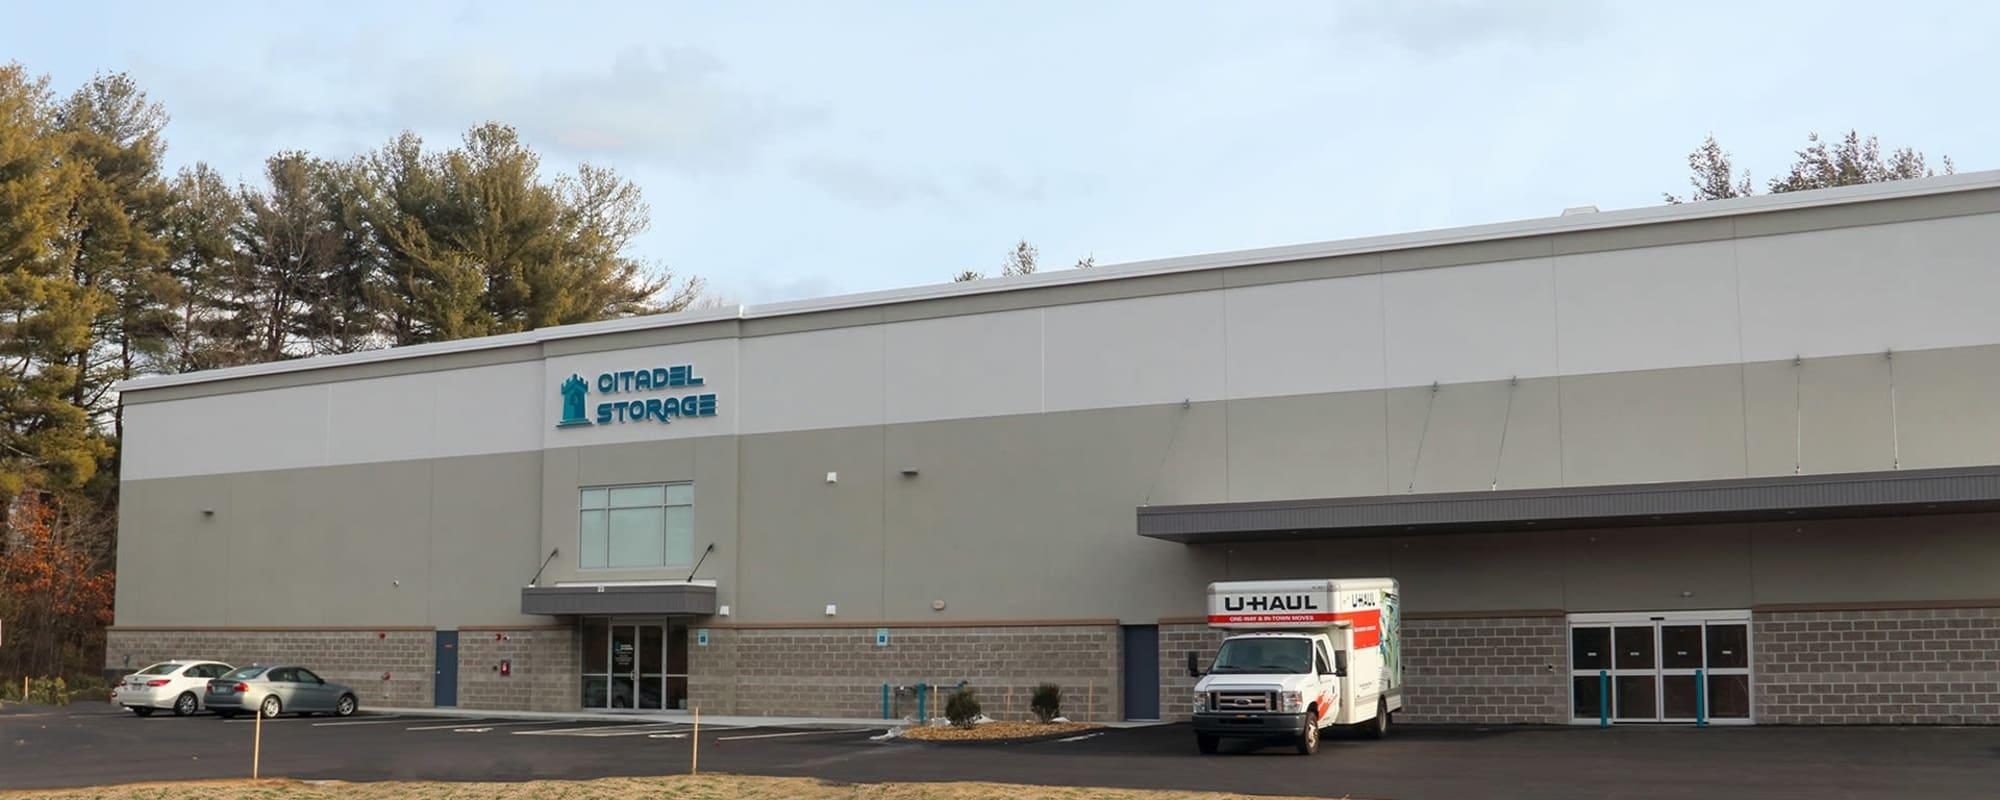 603 Storage - Hudson self storage in Hudson, New Hampshire